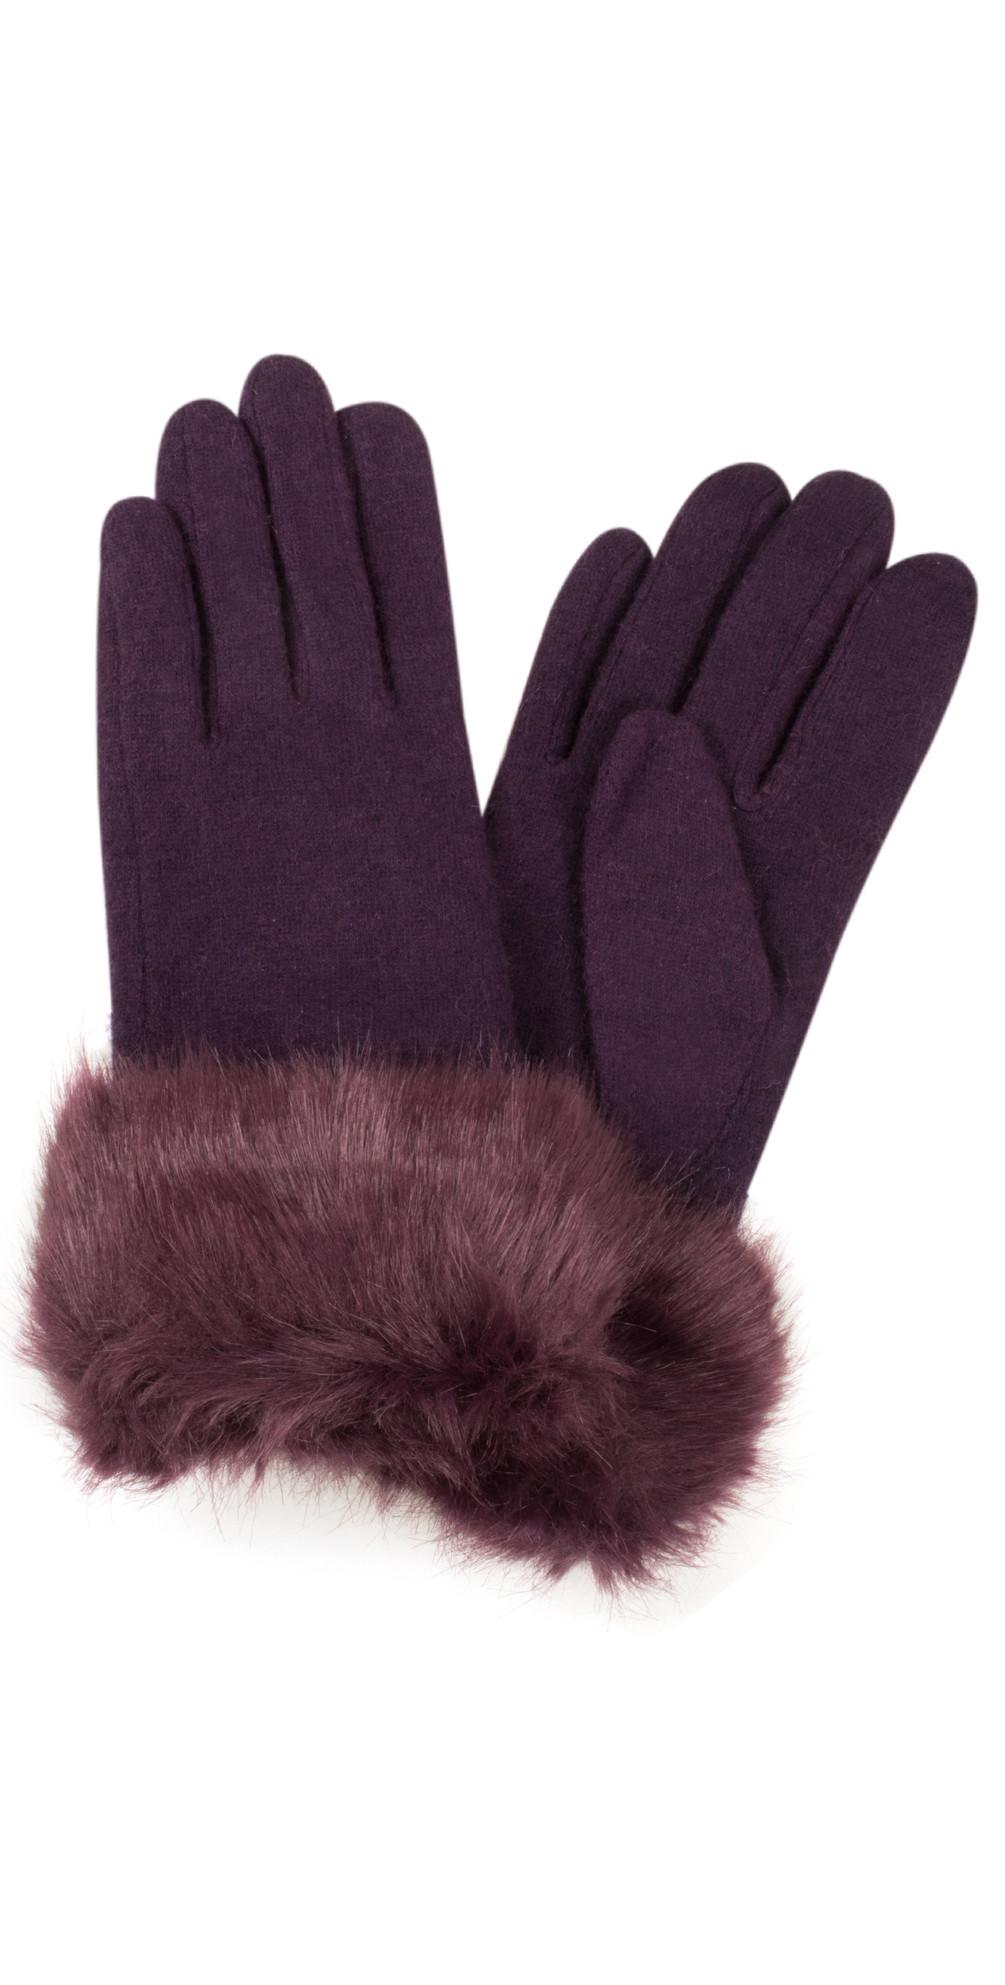 Monroe Glove main image